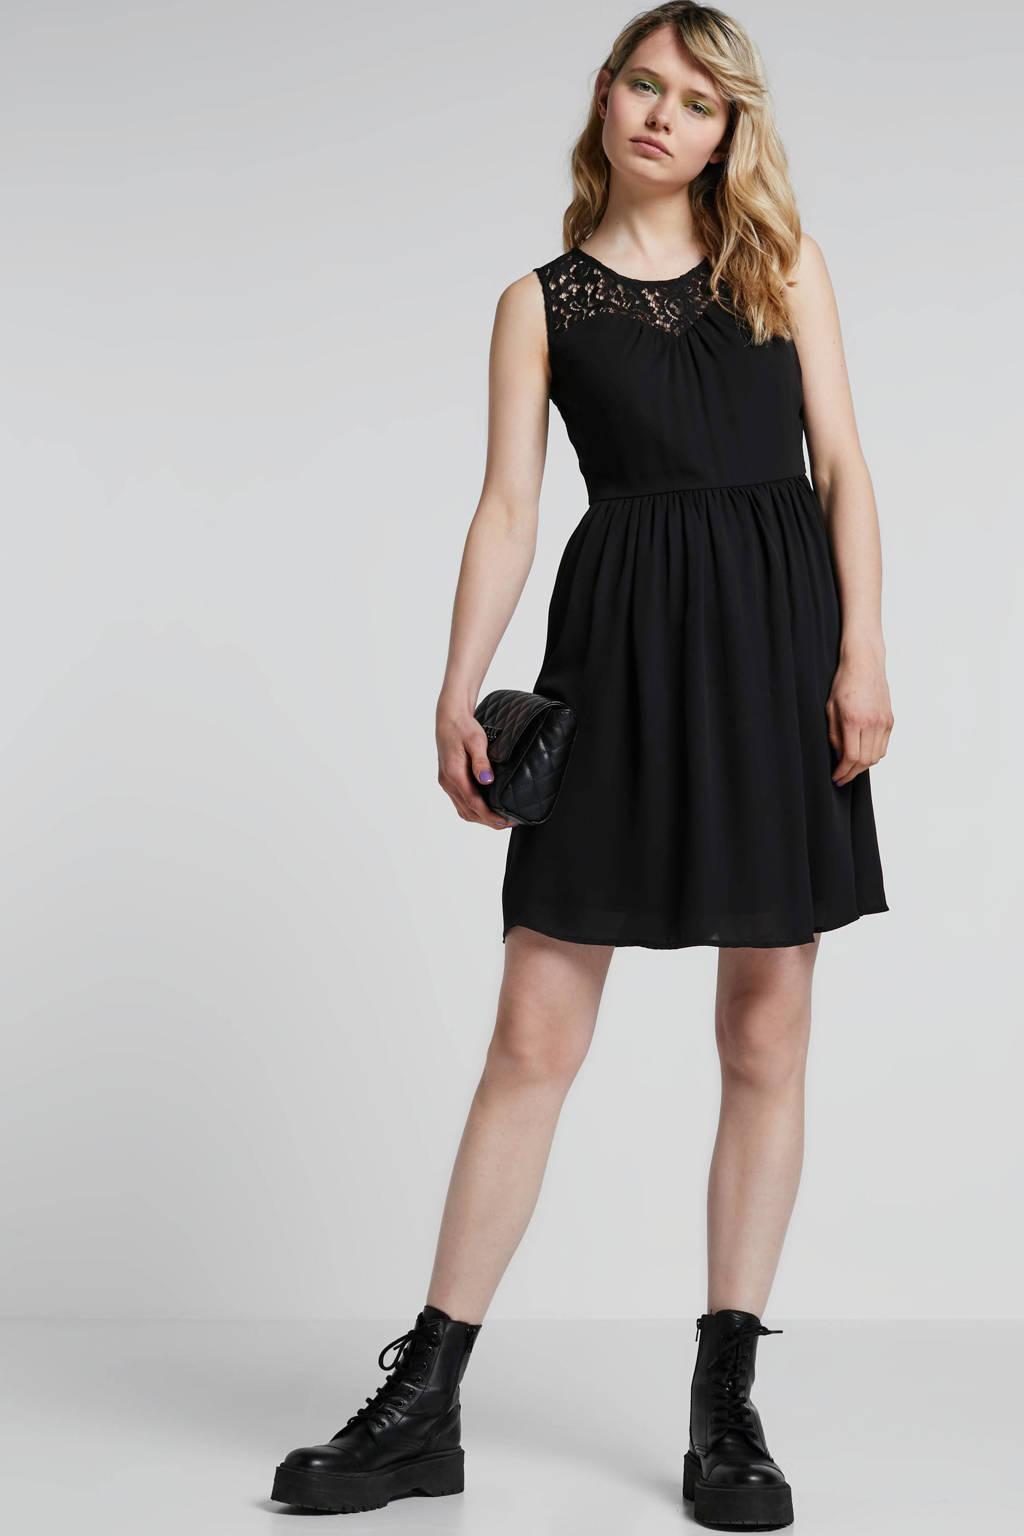 ONLY jurk met kant zwart, Zwart